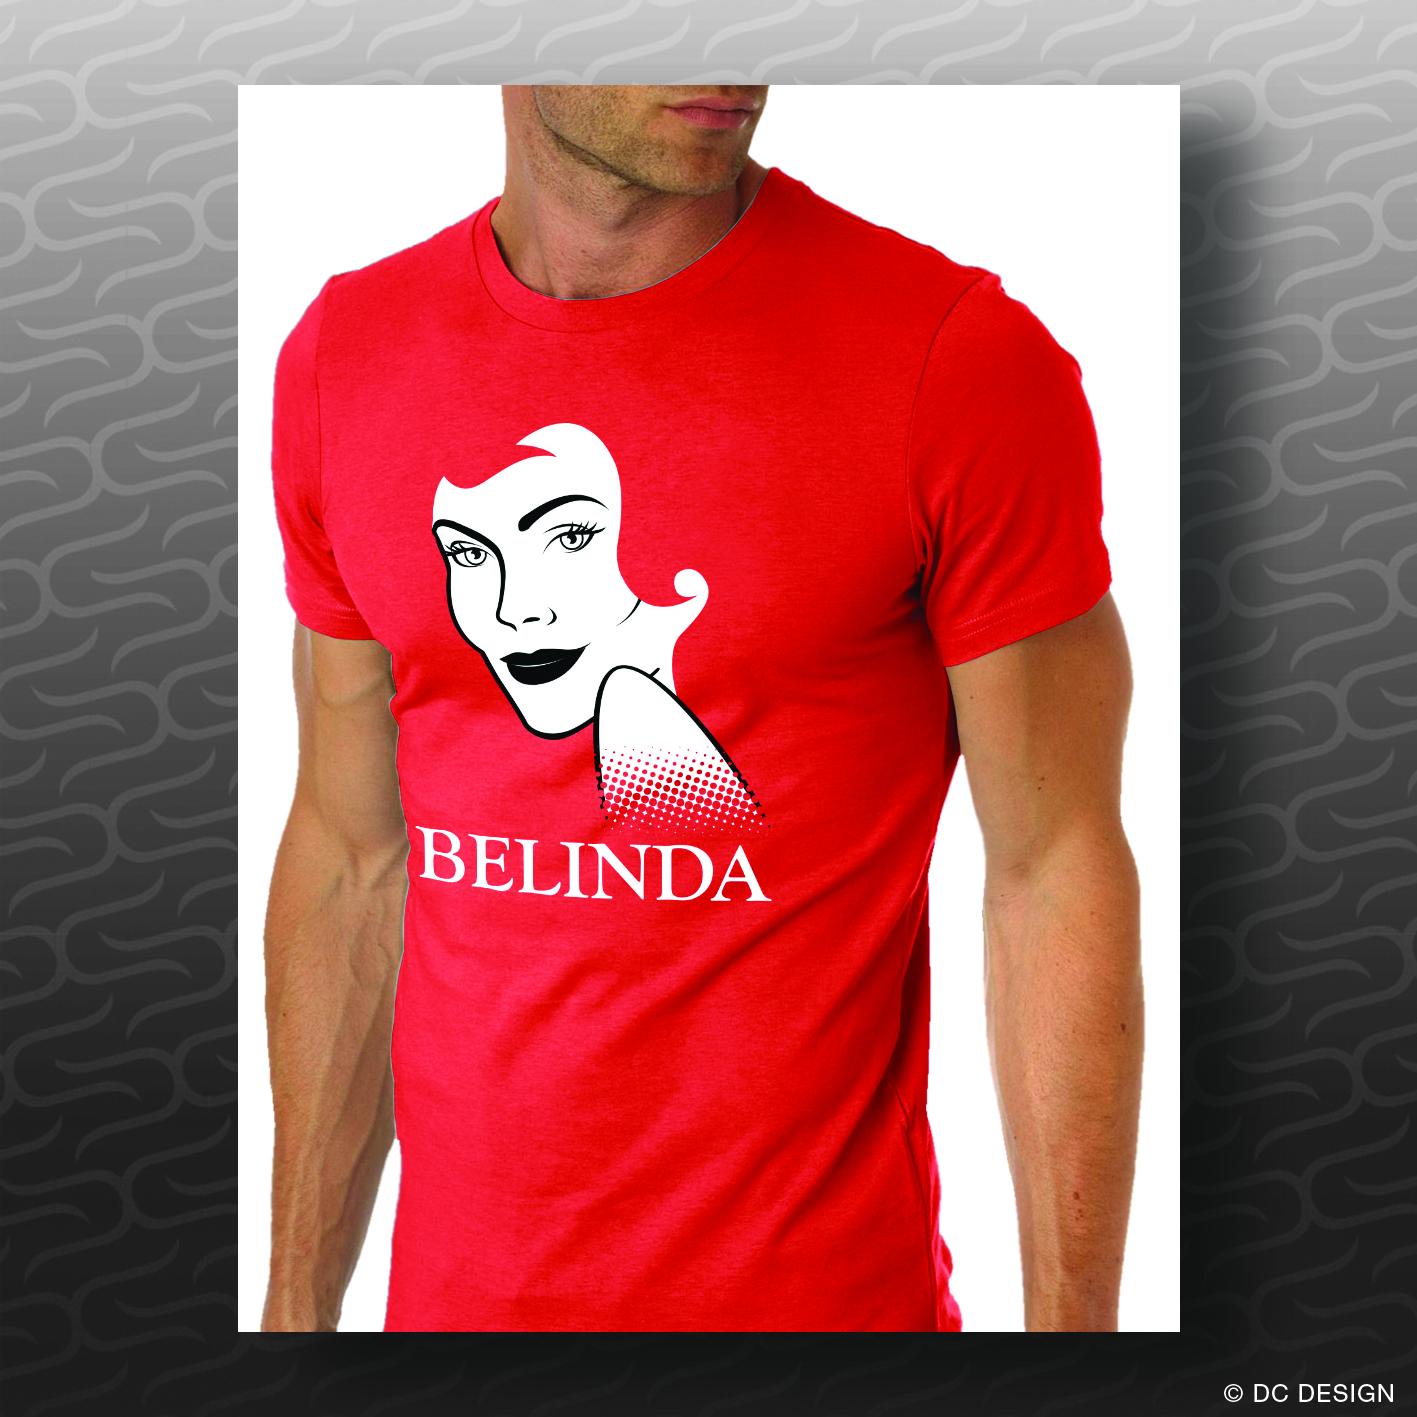 Dc design t shirt design for Dc t shirt design